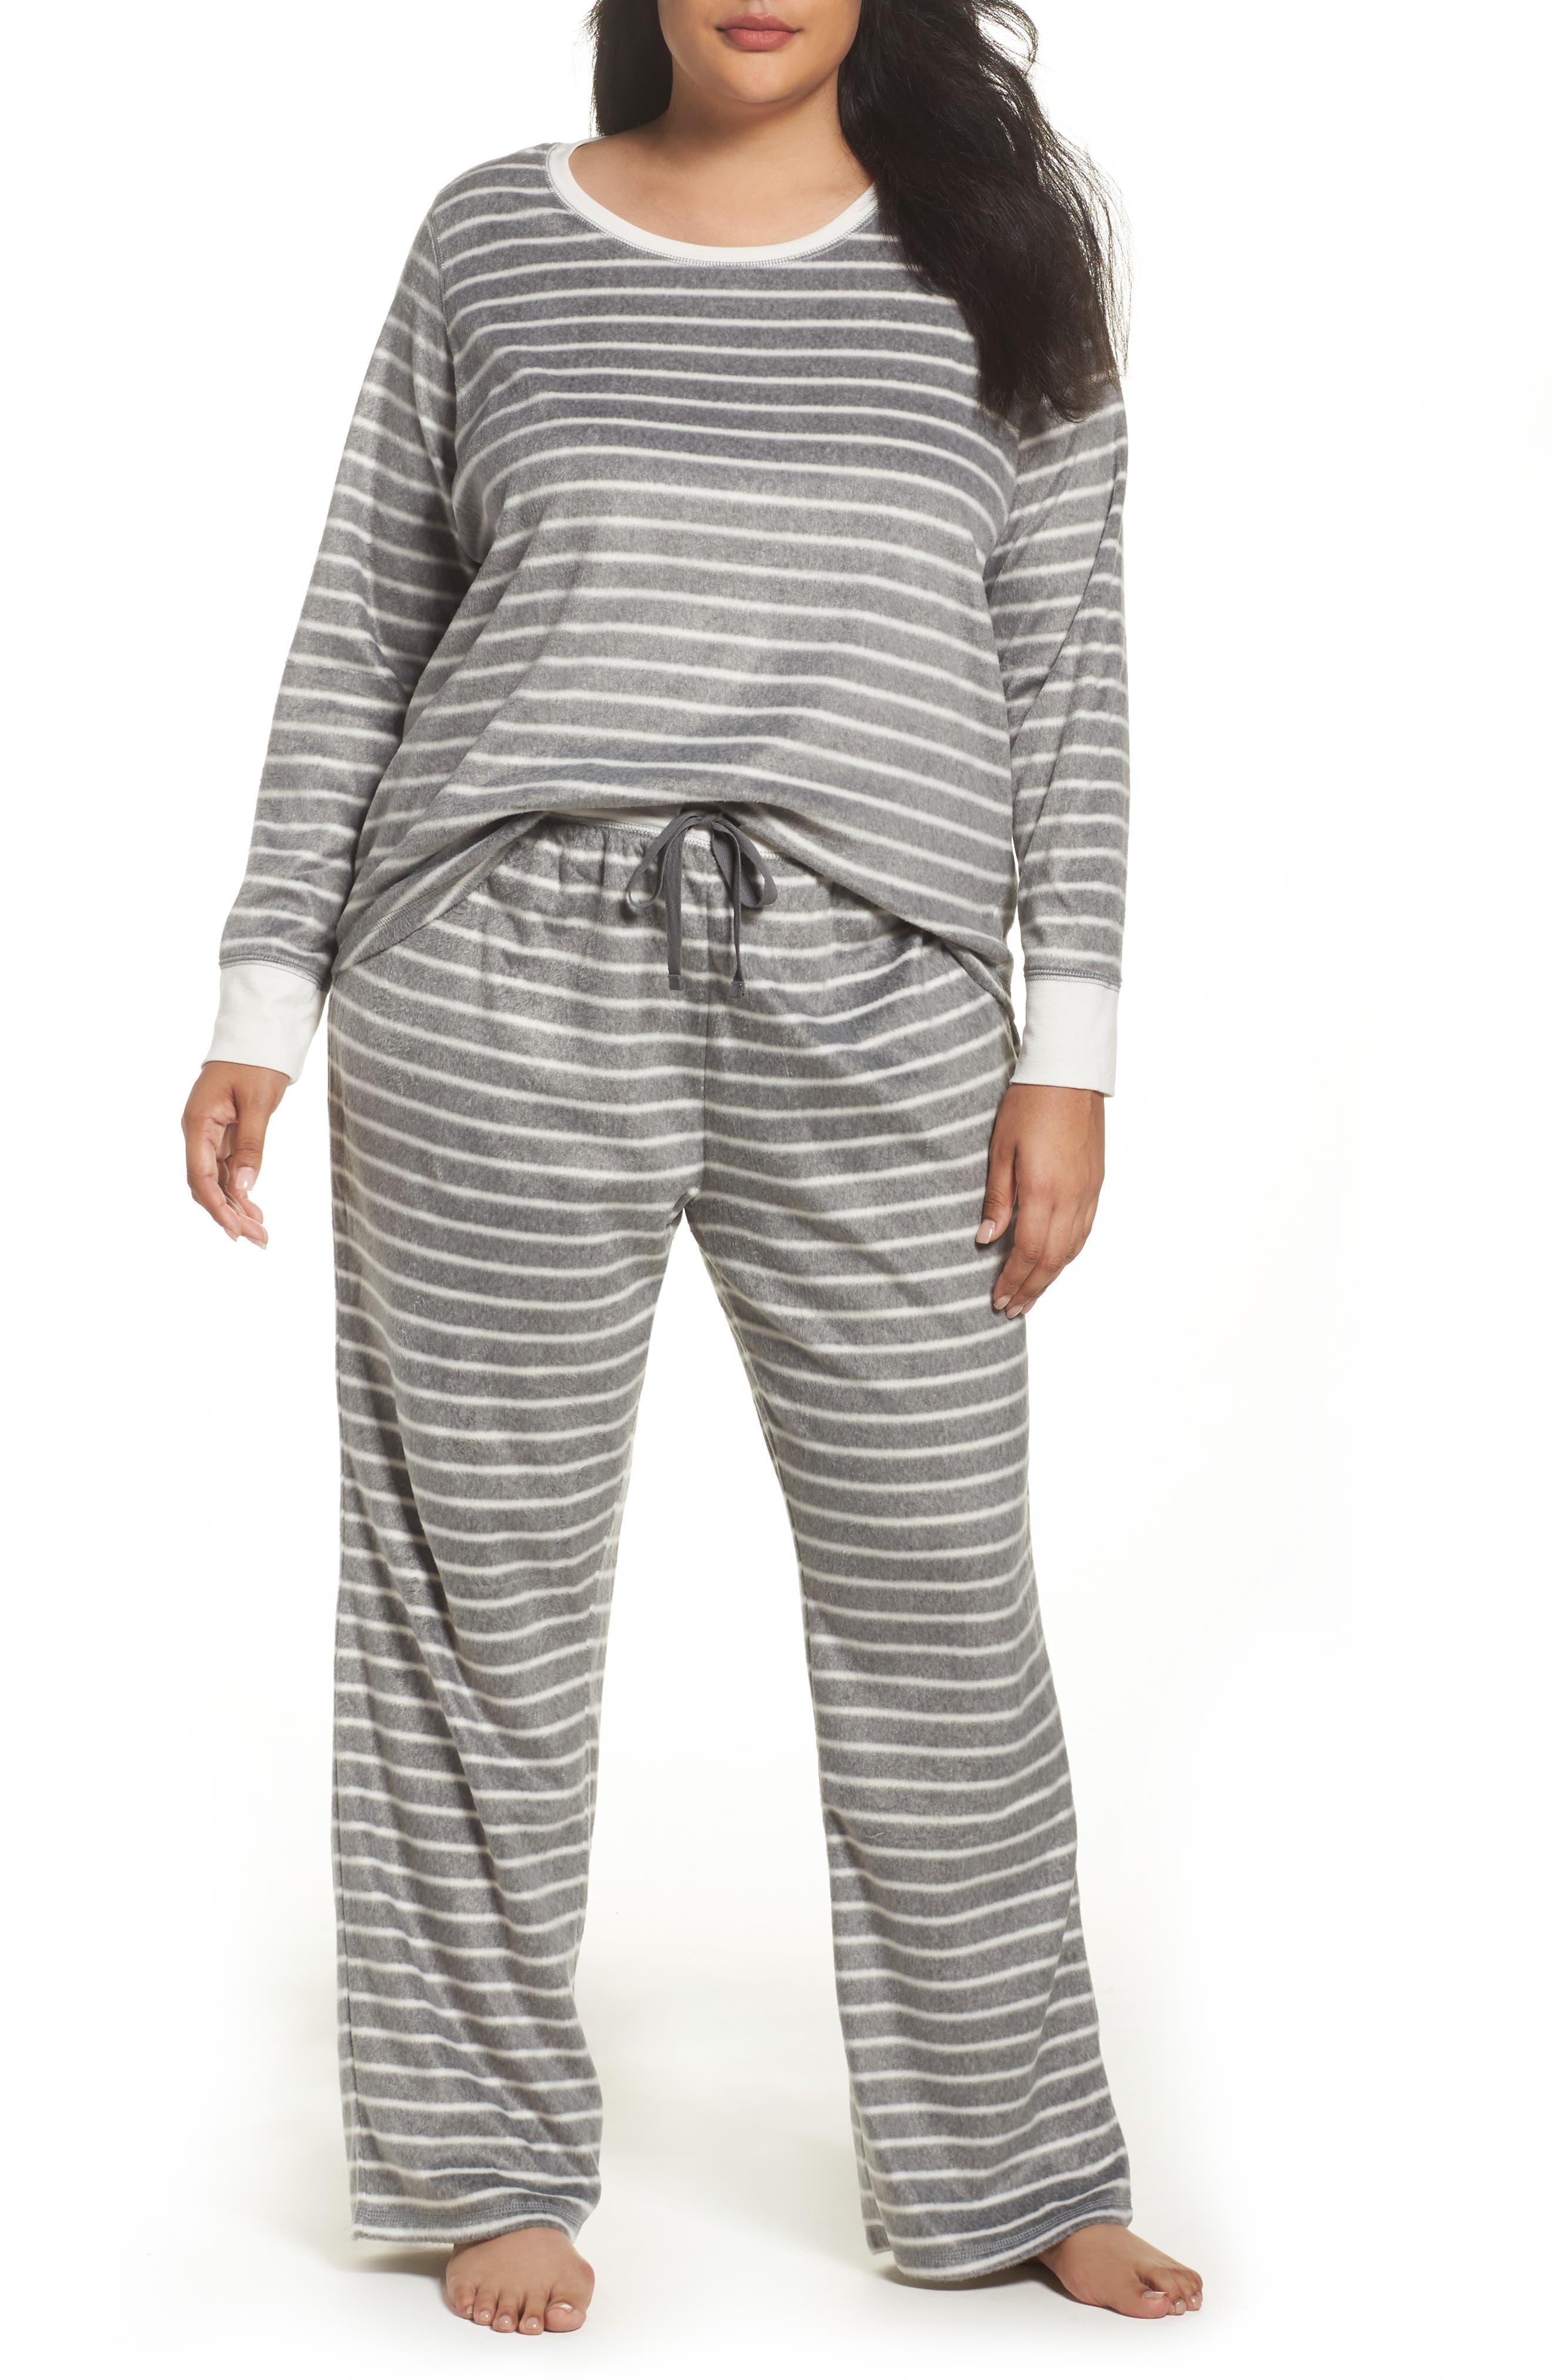 Polar Fleece Pajamas,                             Main thumbnail 1, color,                             Heather Grey